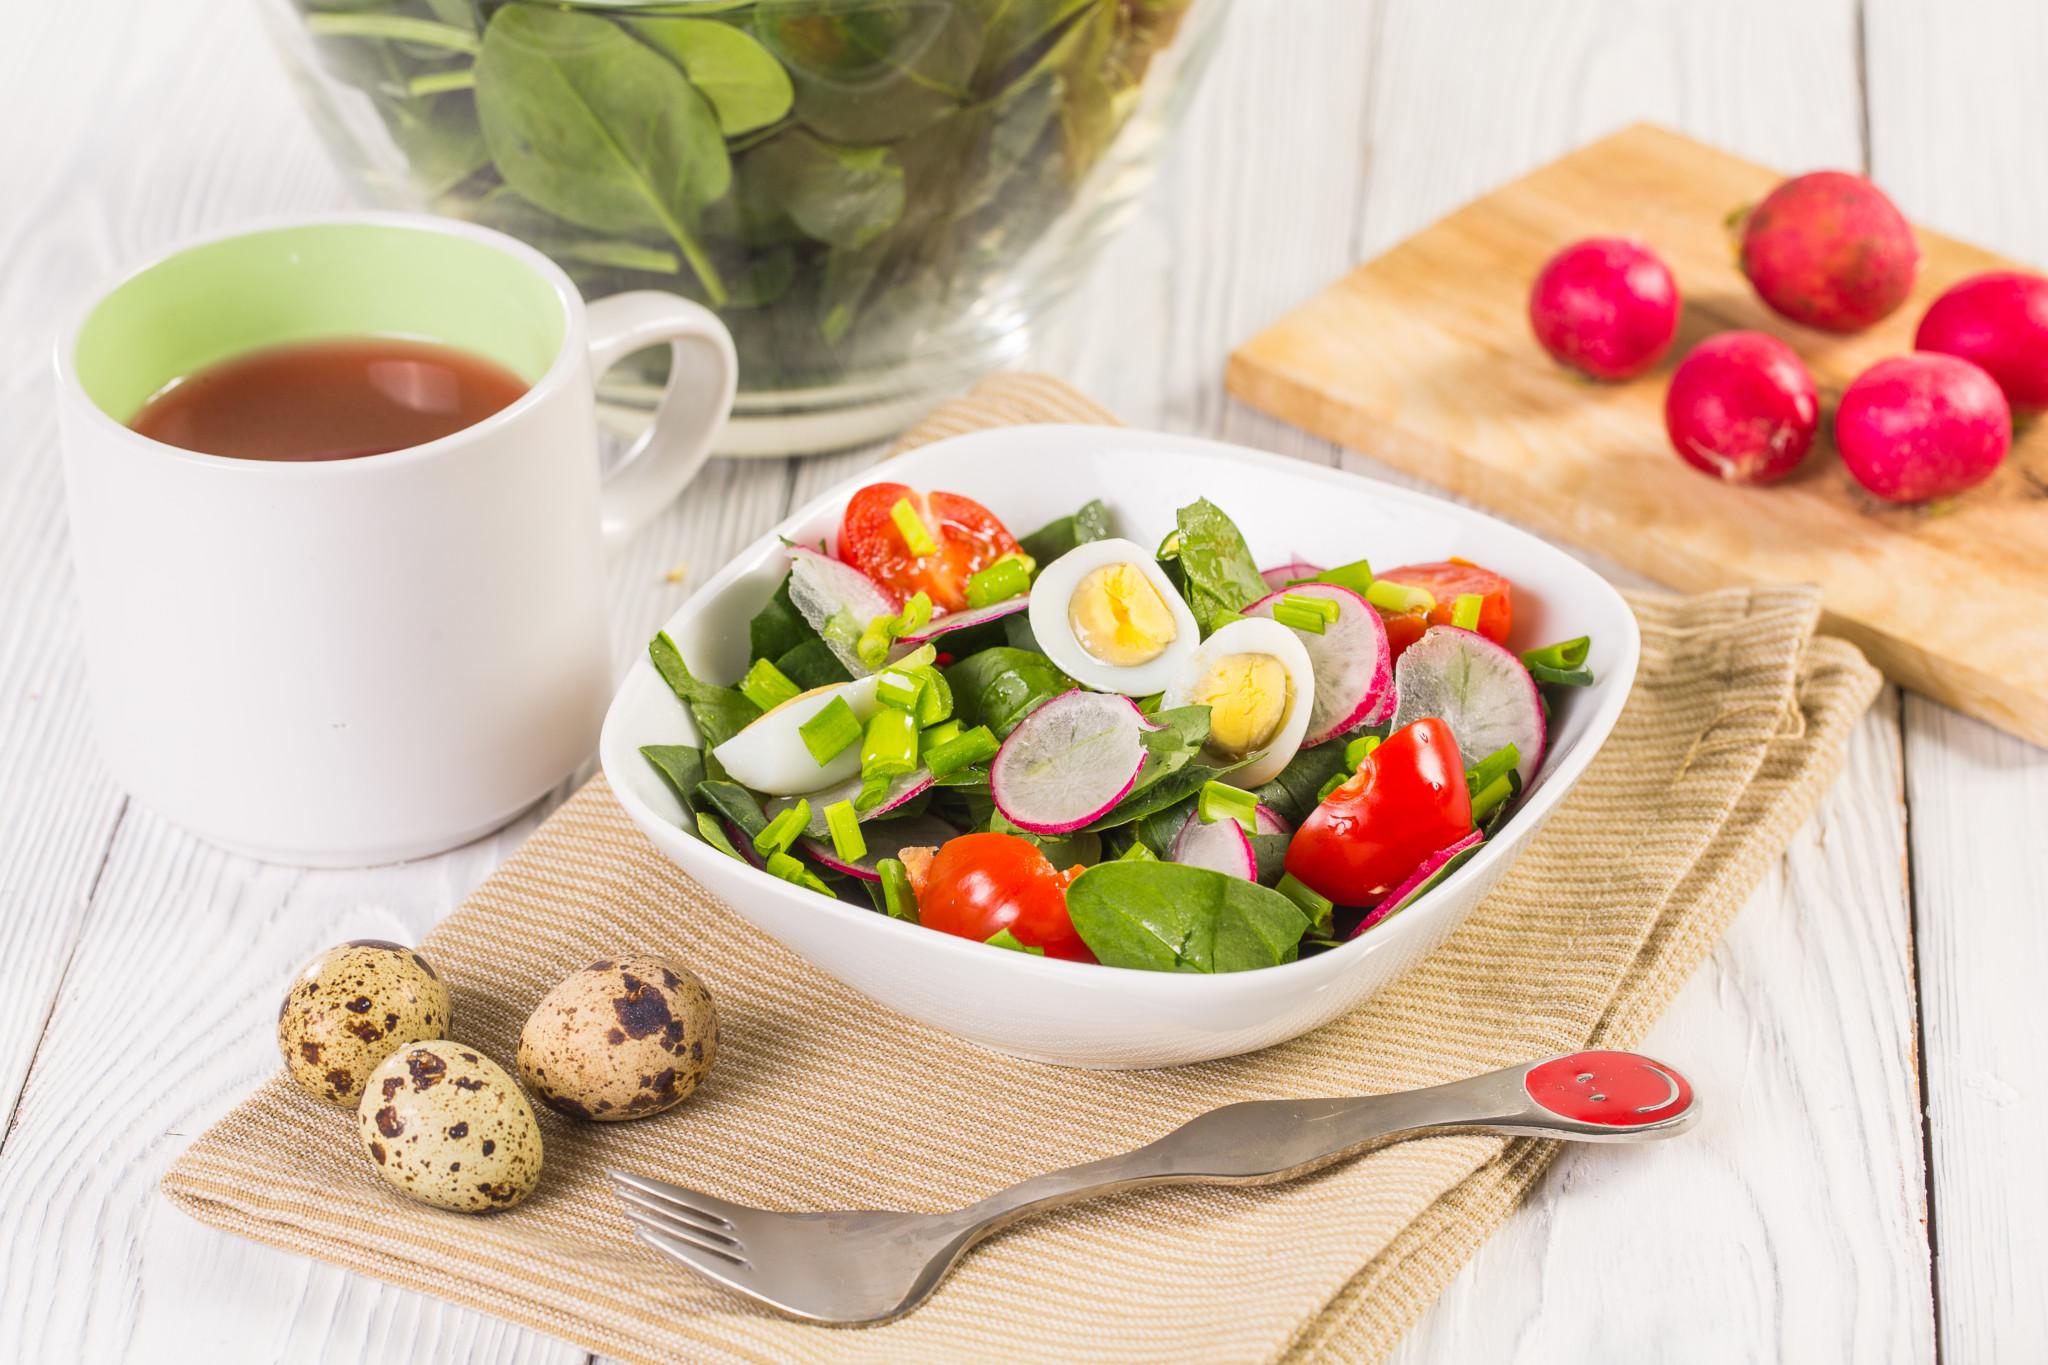 рецепт салата из колбасы с яйцом